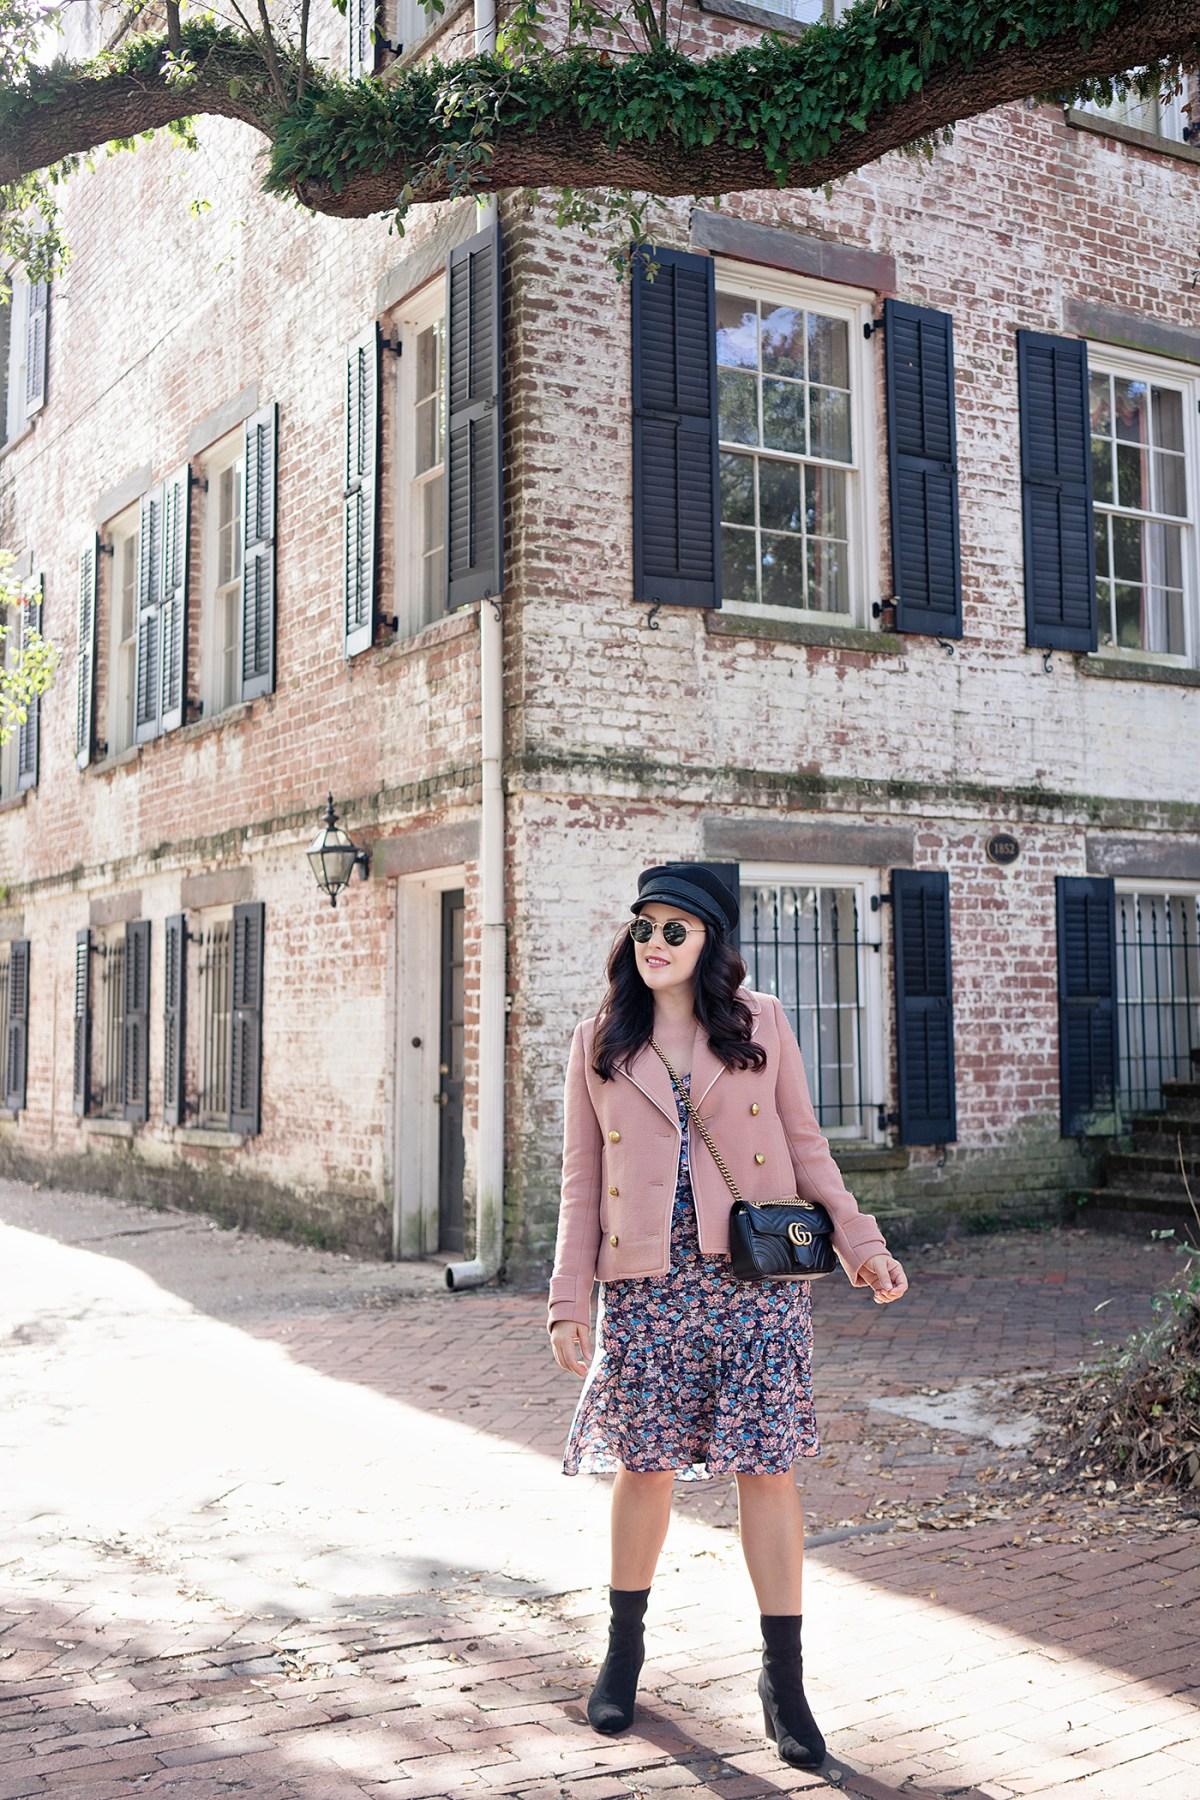 Best Photo Spots in Savannah